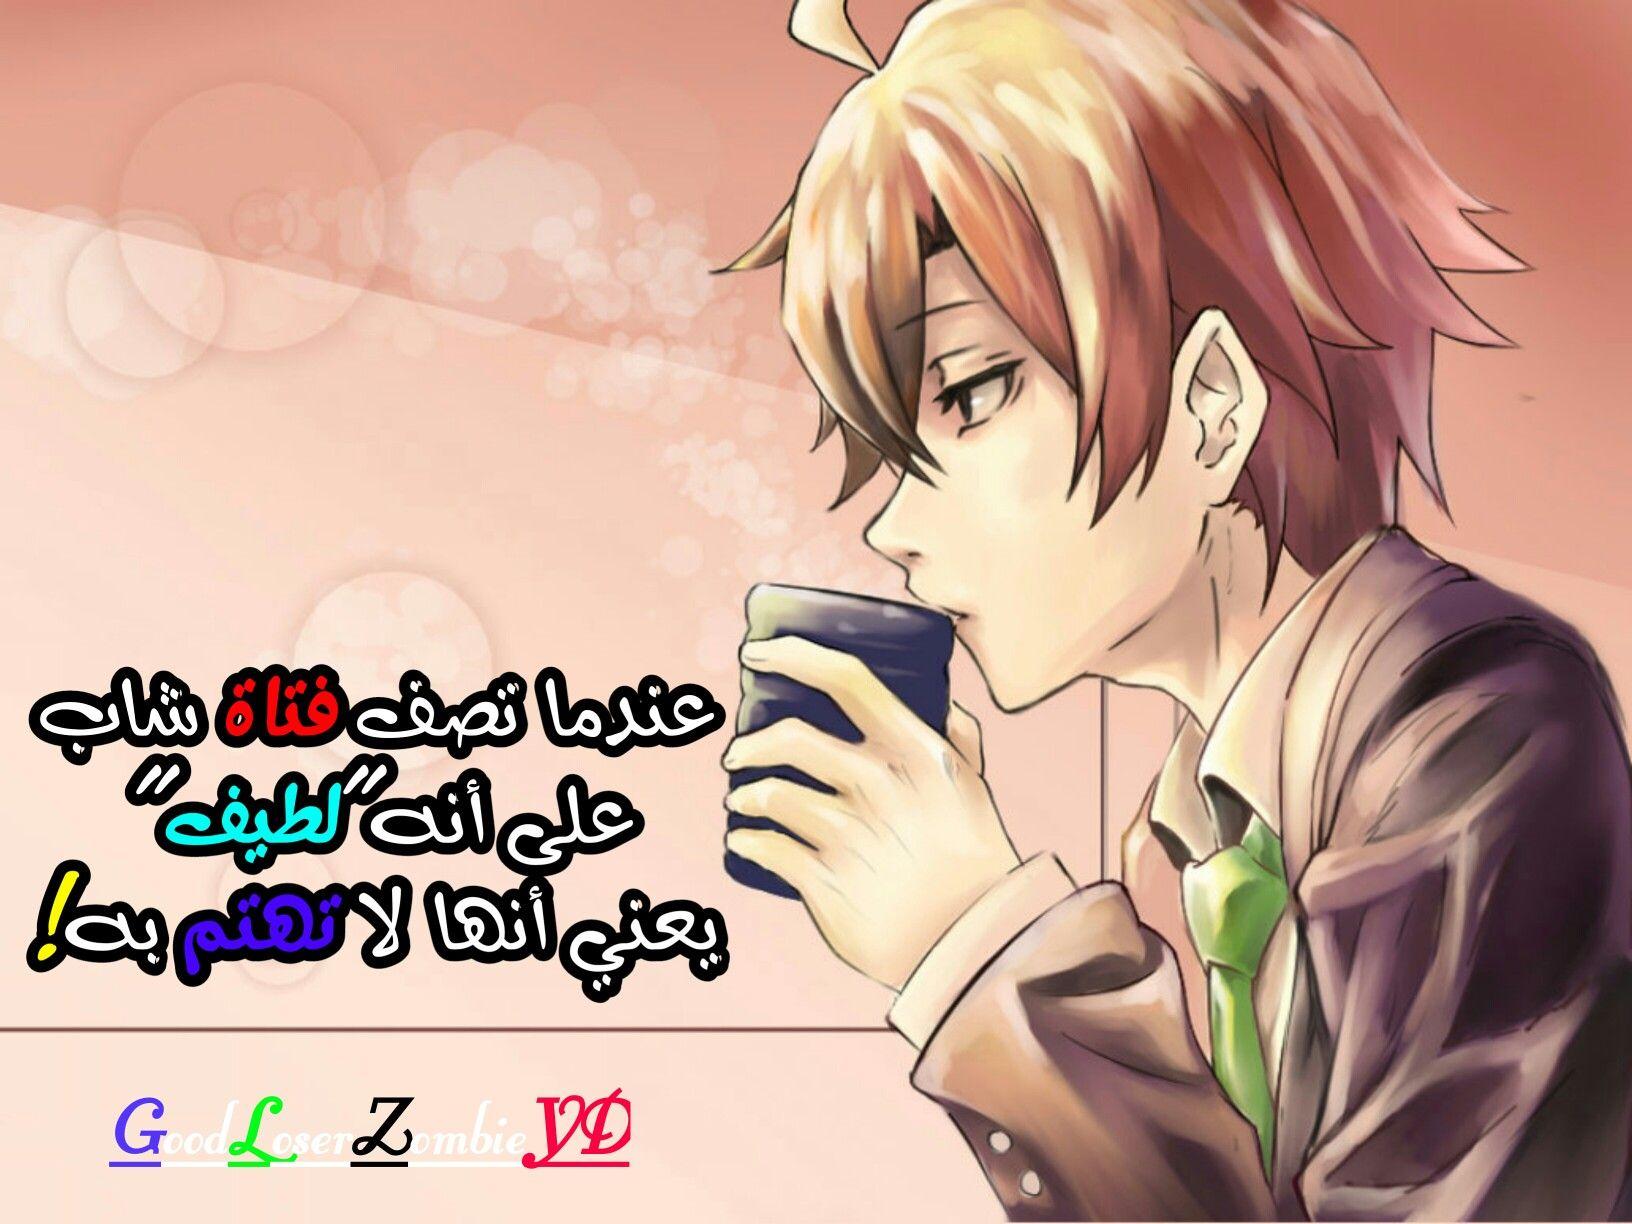 Hikigaya Hachiman هيكيغايا هاتشيمان مقولات اقتباسات انمي مضحكة Anime Manga To Read Manga News